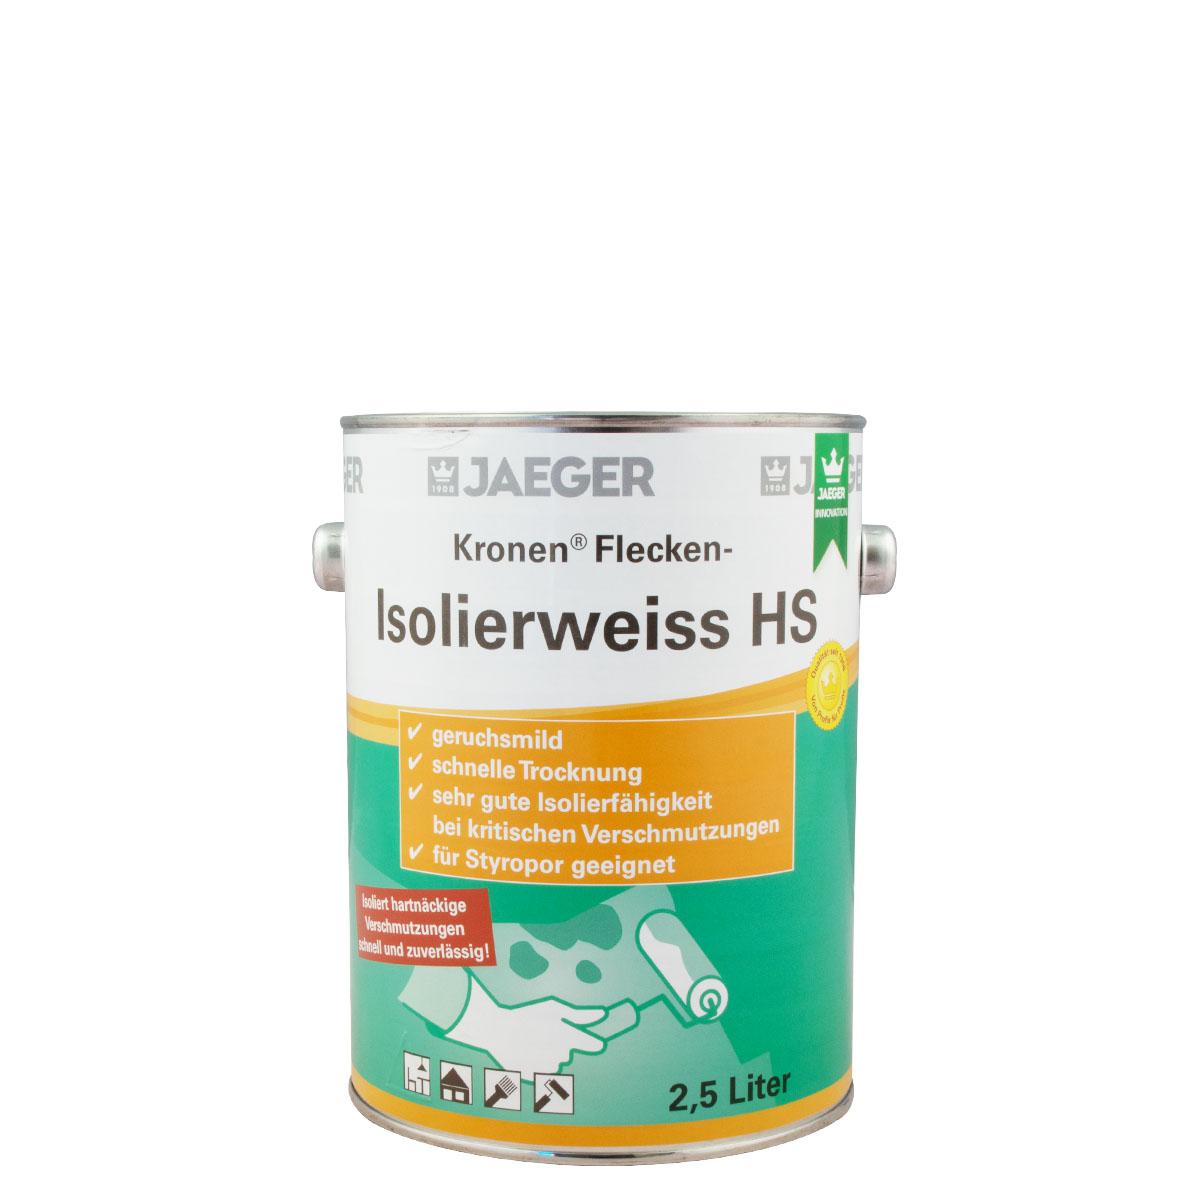 Jaeger 123 Kronen Flecken-Isolierweiss HS 2,5L